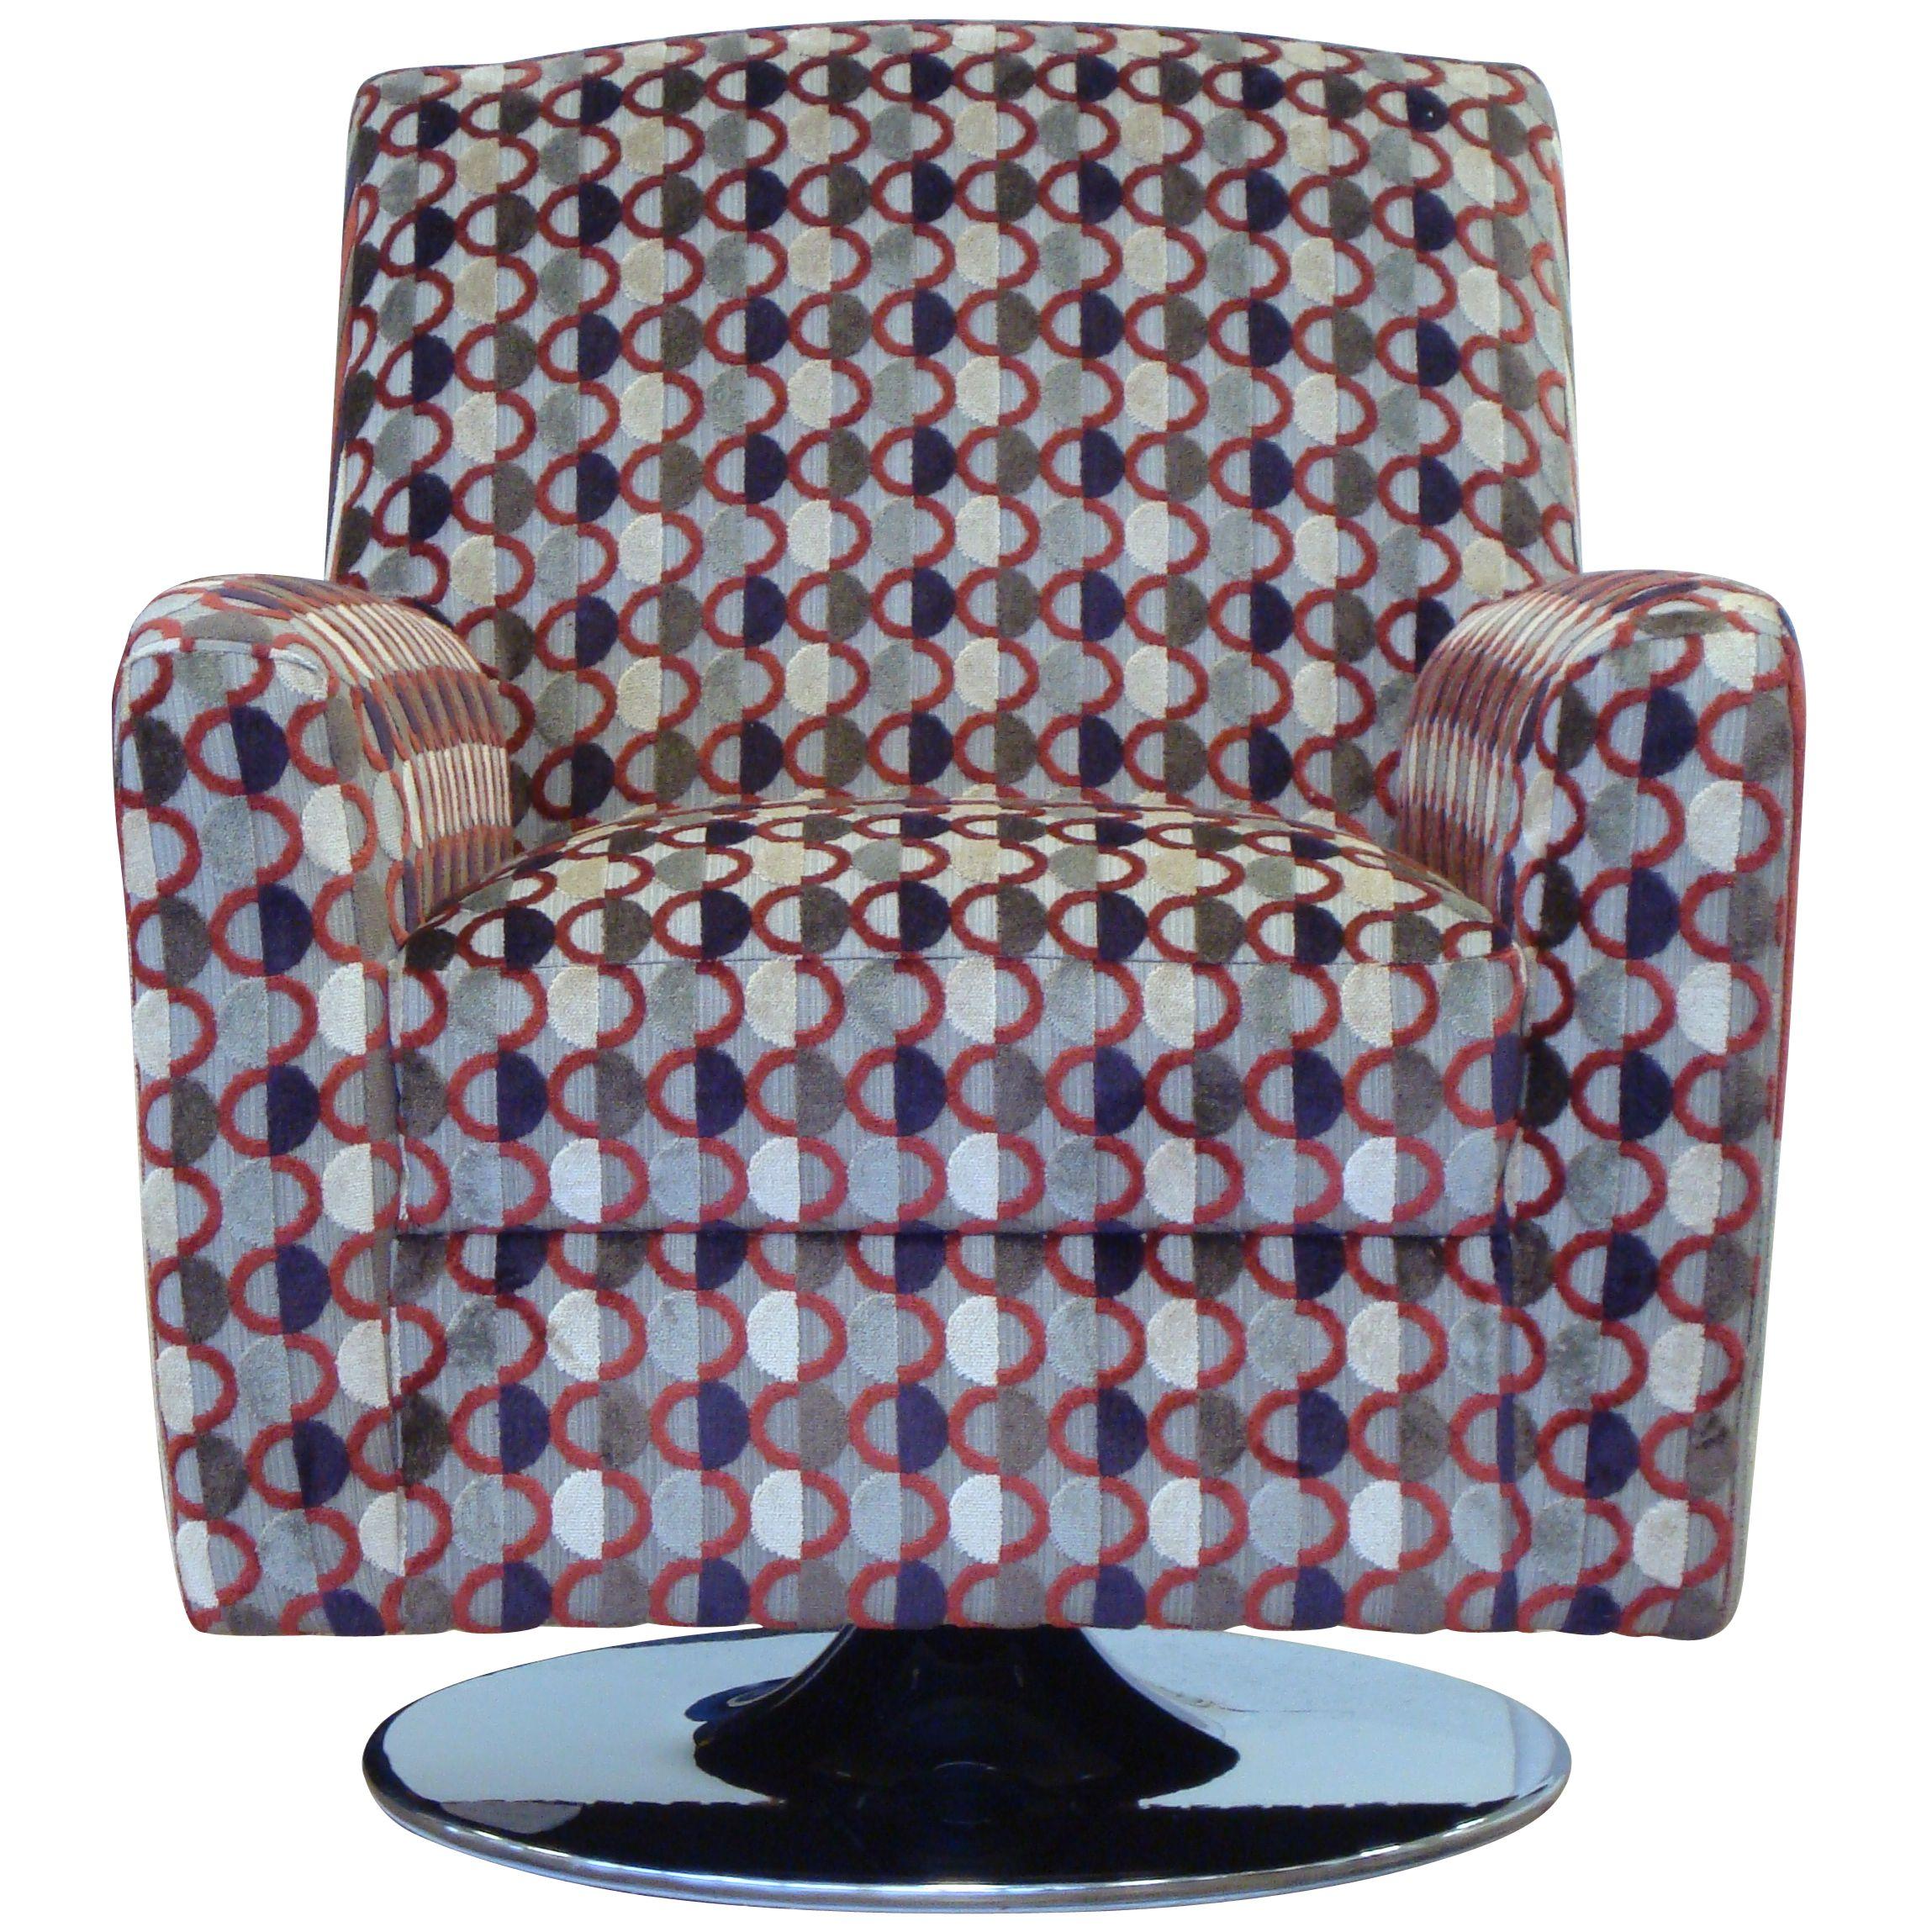 John Lewis Sullivan Swivel Chair, Spot at John Lewis